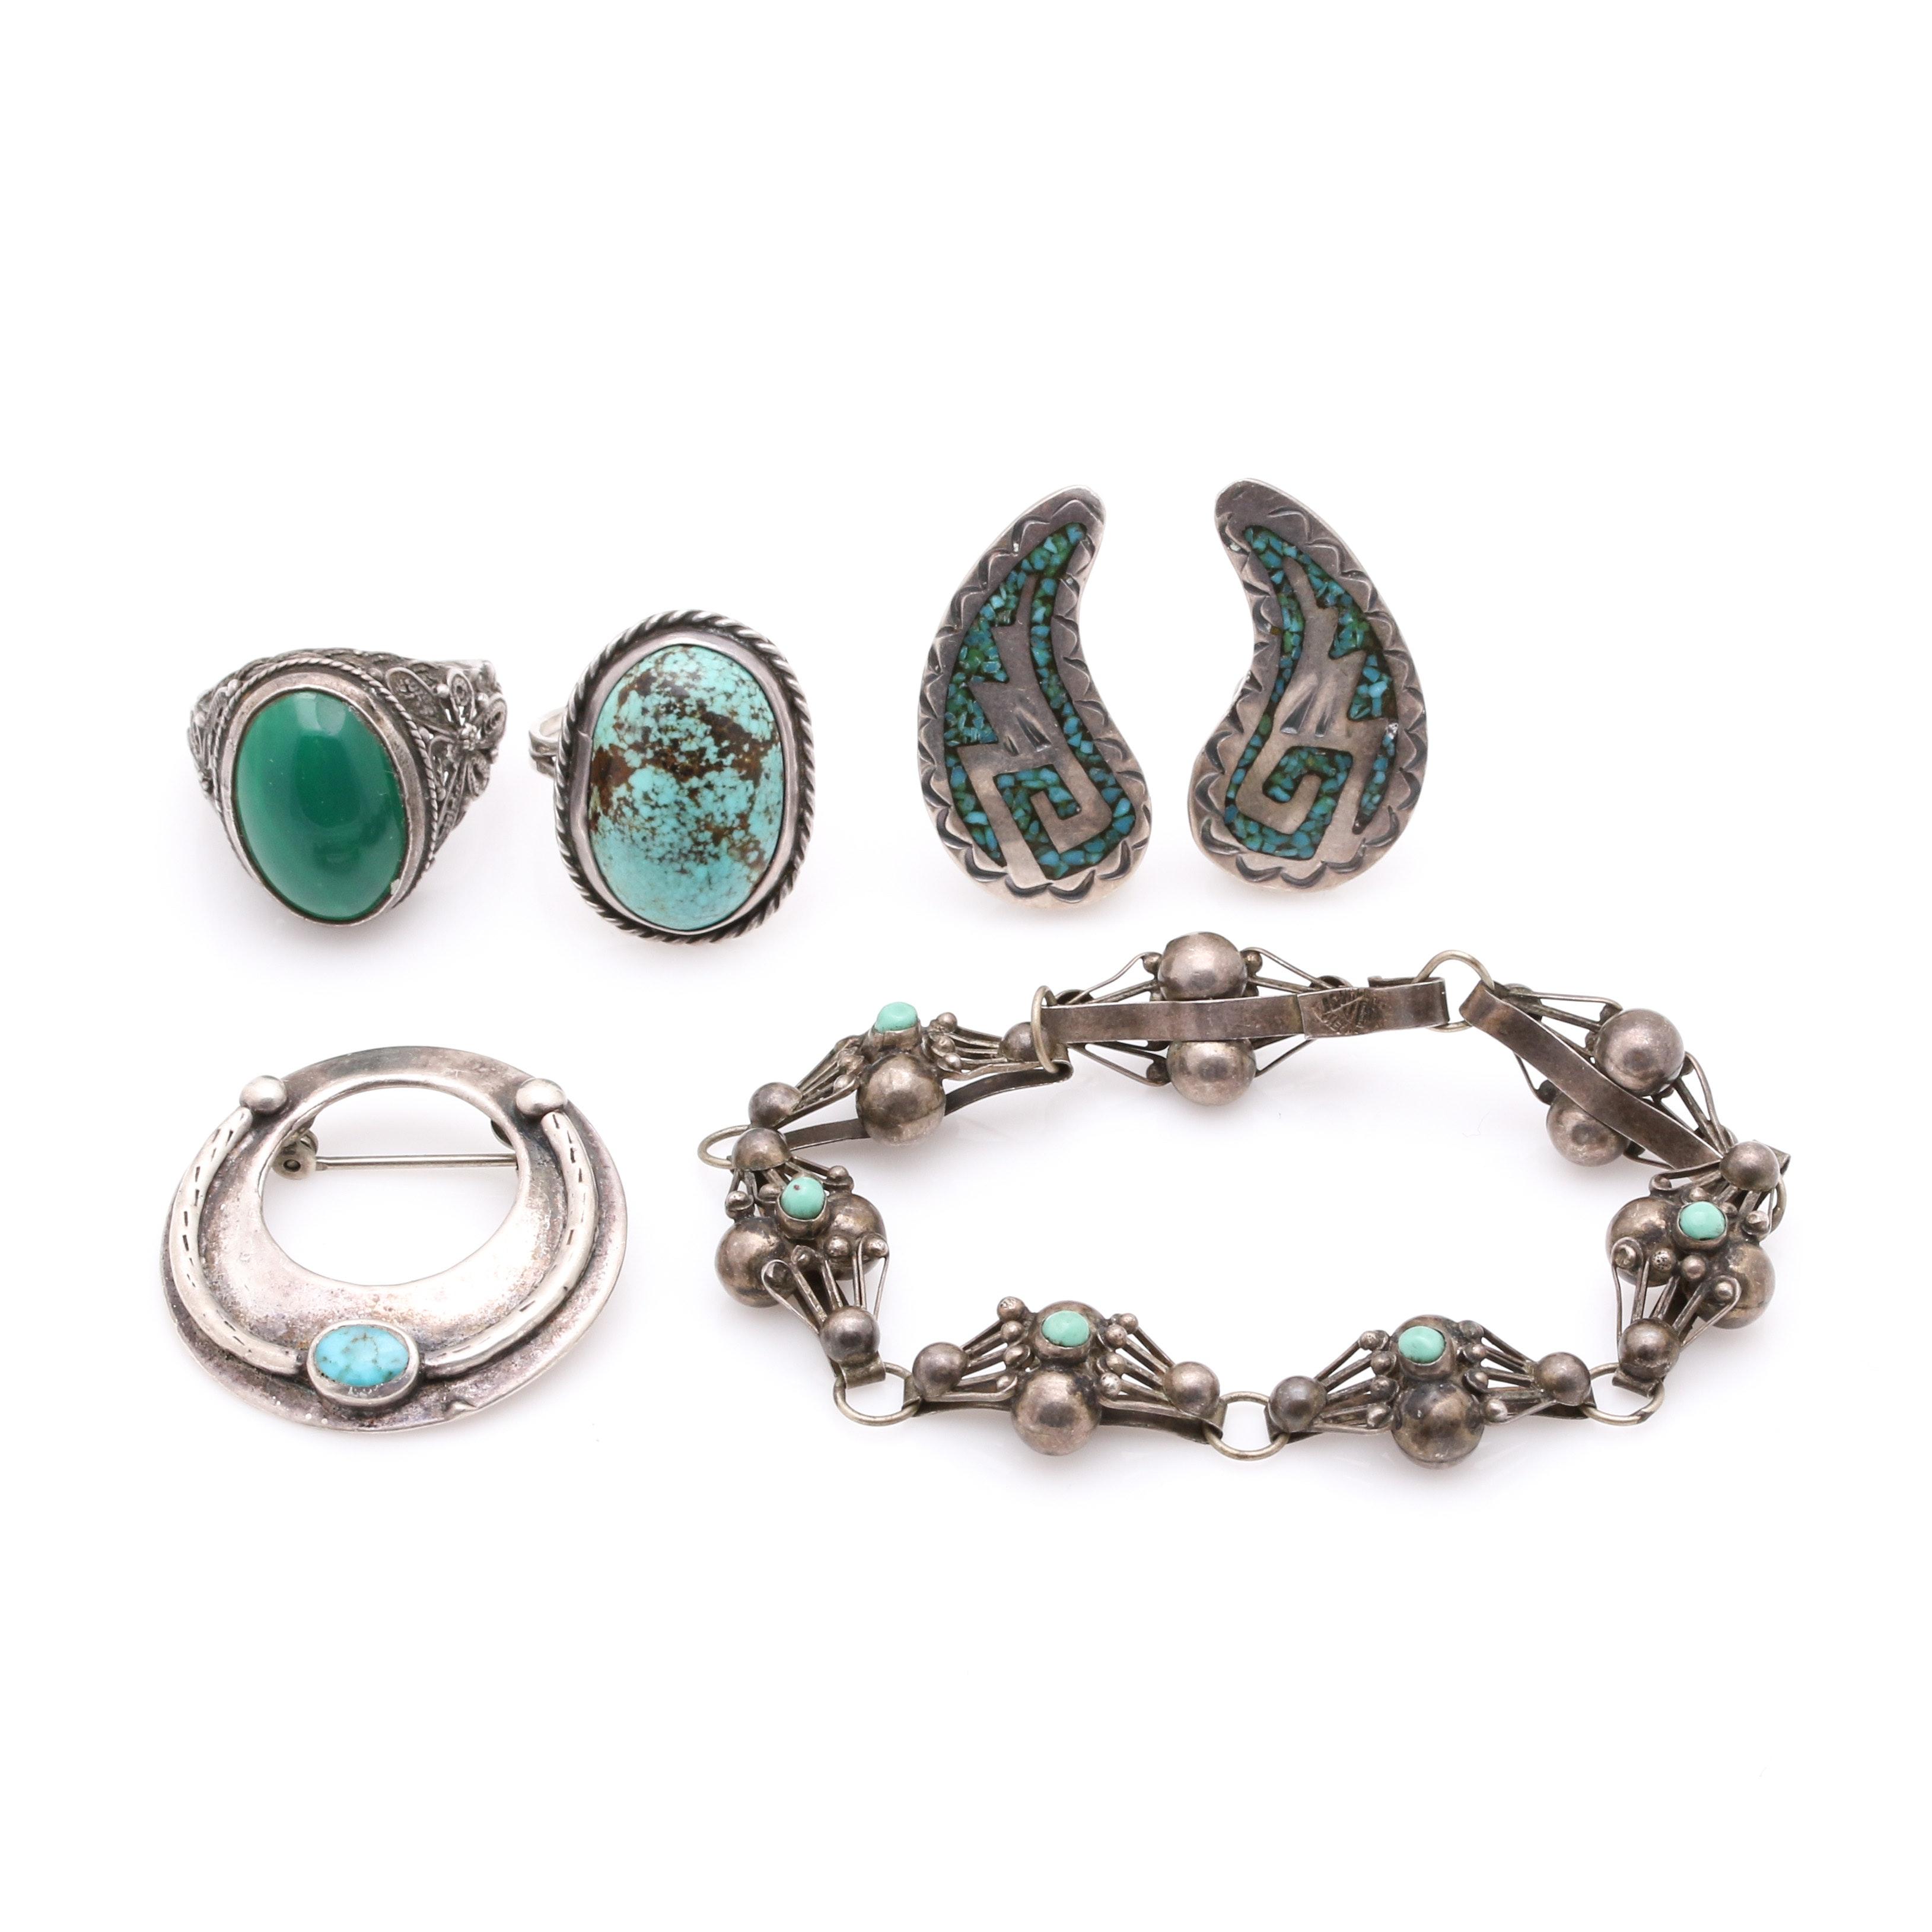 Southwestern Style Sterling Silver Gemstone Jewelry